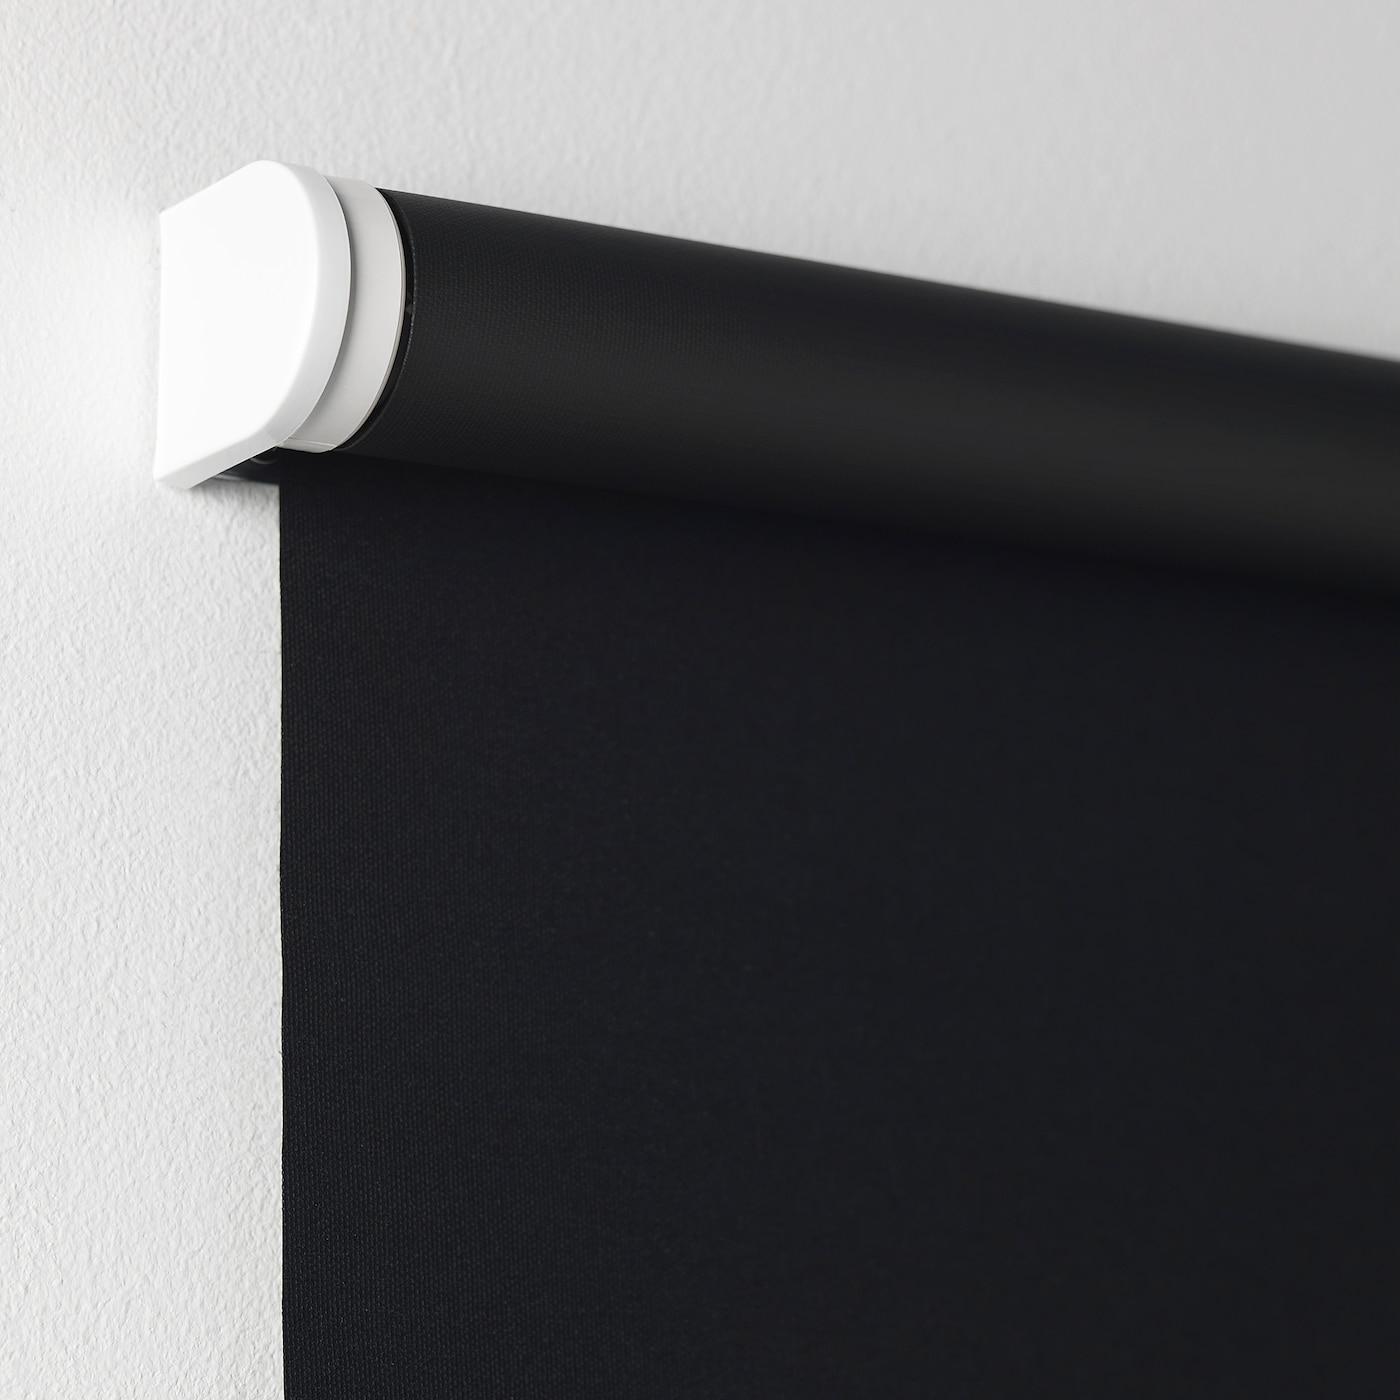 White Tupplur Block Out Roller Blind Curtains Blinds Wholesale Job Lots Plastpath Com Br